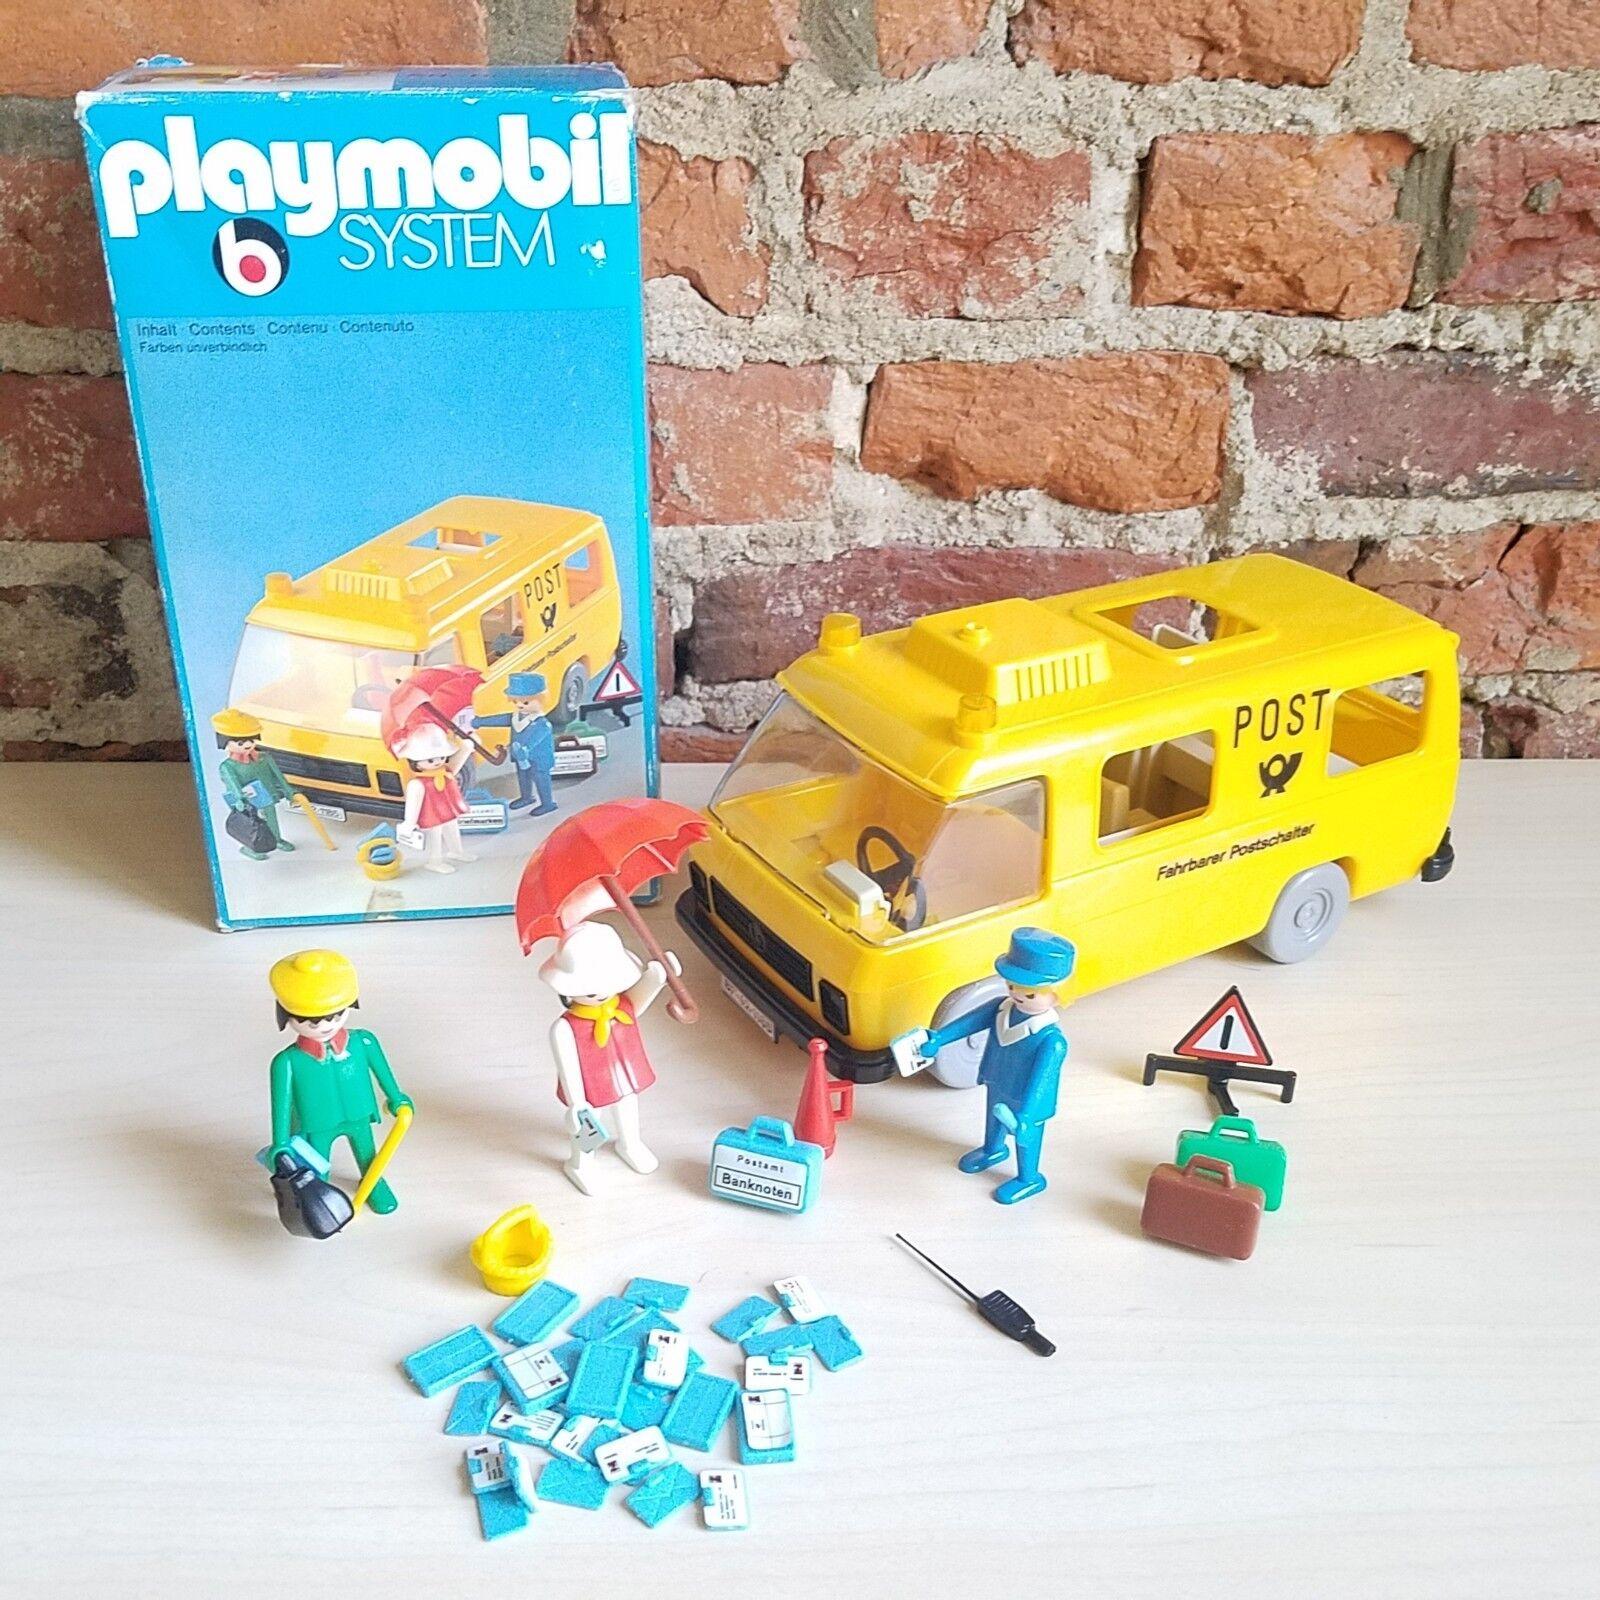 PLAYMOBIL Nº 3235 postal  Van  soutenir le commerce de gros